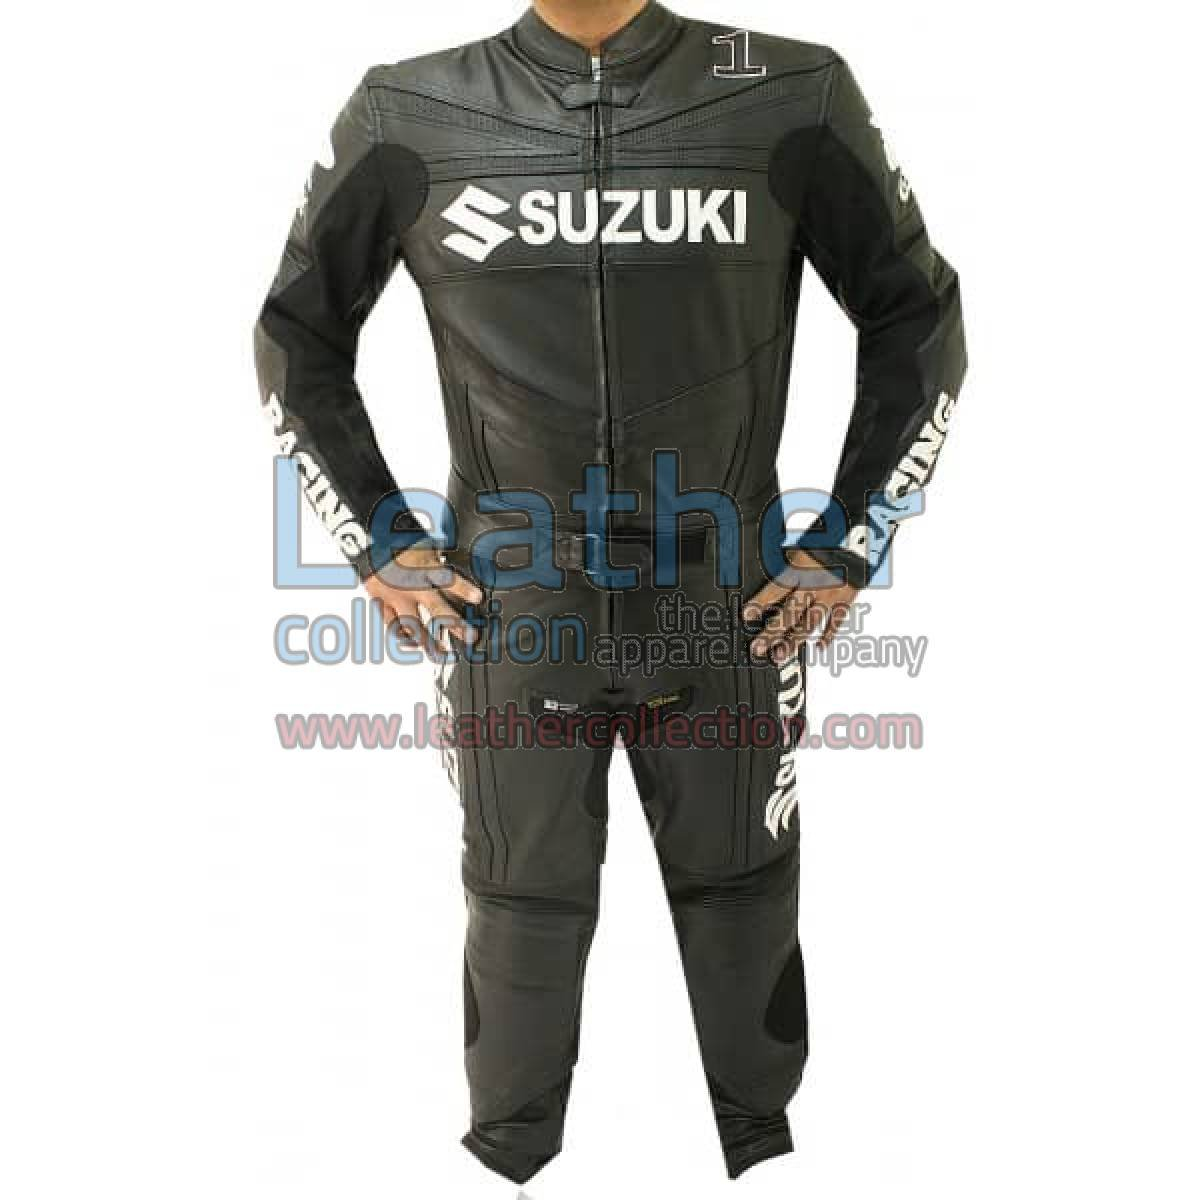 Suzuki Leather Racing Suit